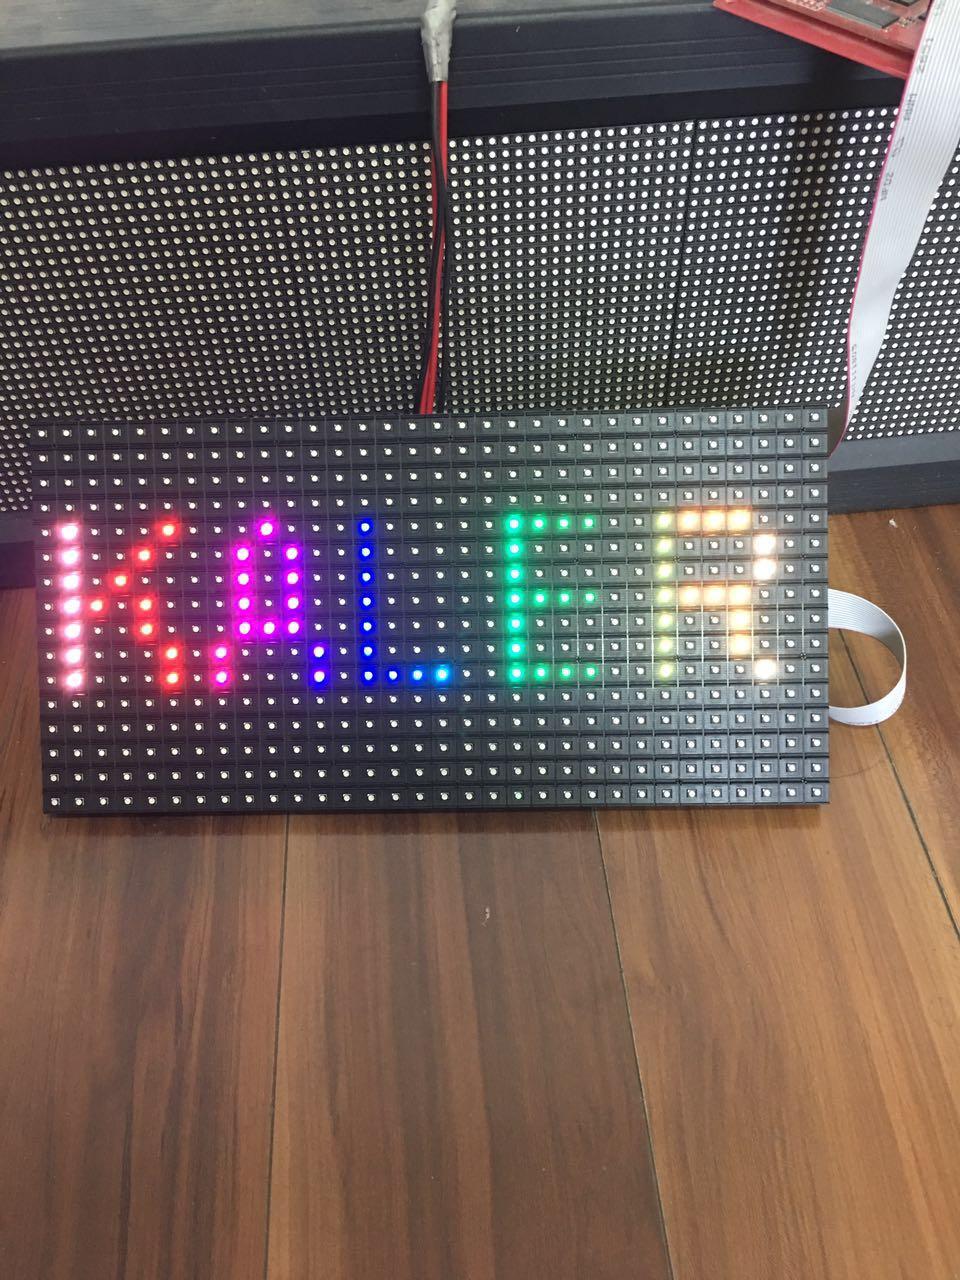 kaler outdoor 320*160mm 32*16pixels 3in1 SMD 1/4 scan RGB P10 full color LED module panel for Advertising media sign LED Display